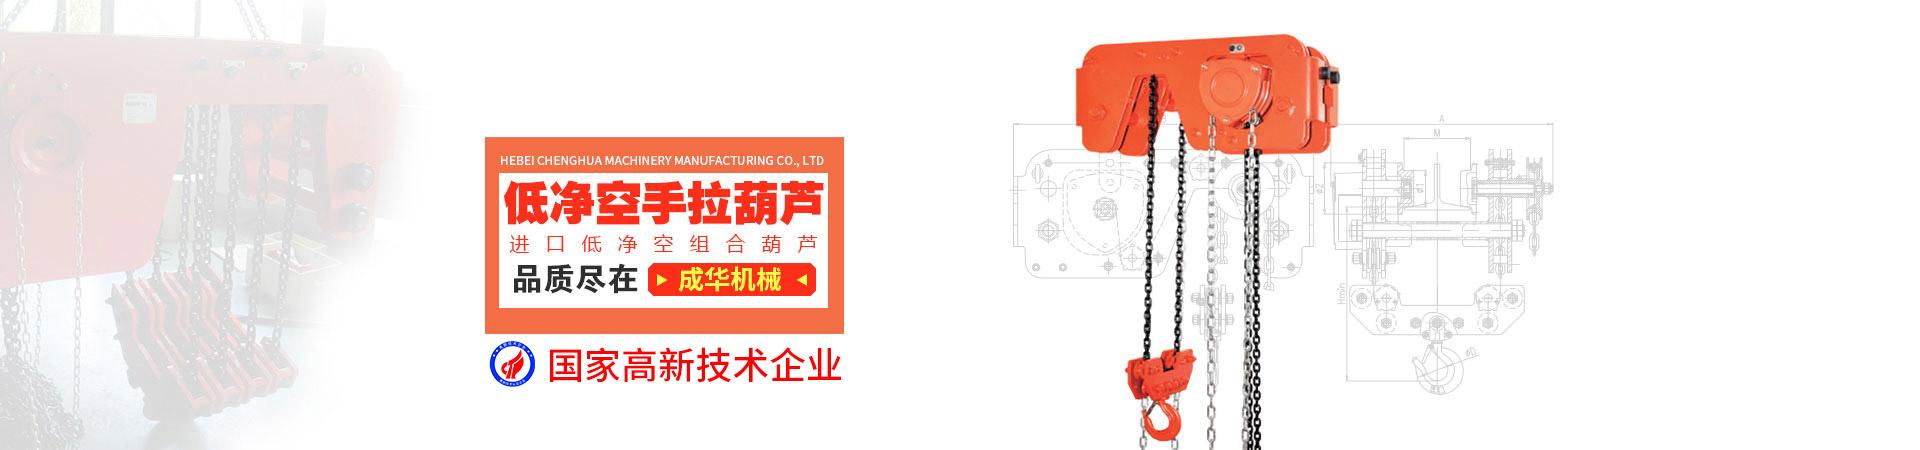 hang州钱gui777机械she备you限公司